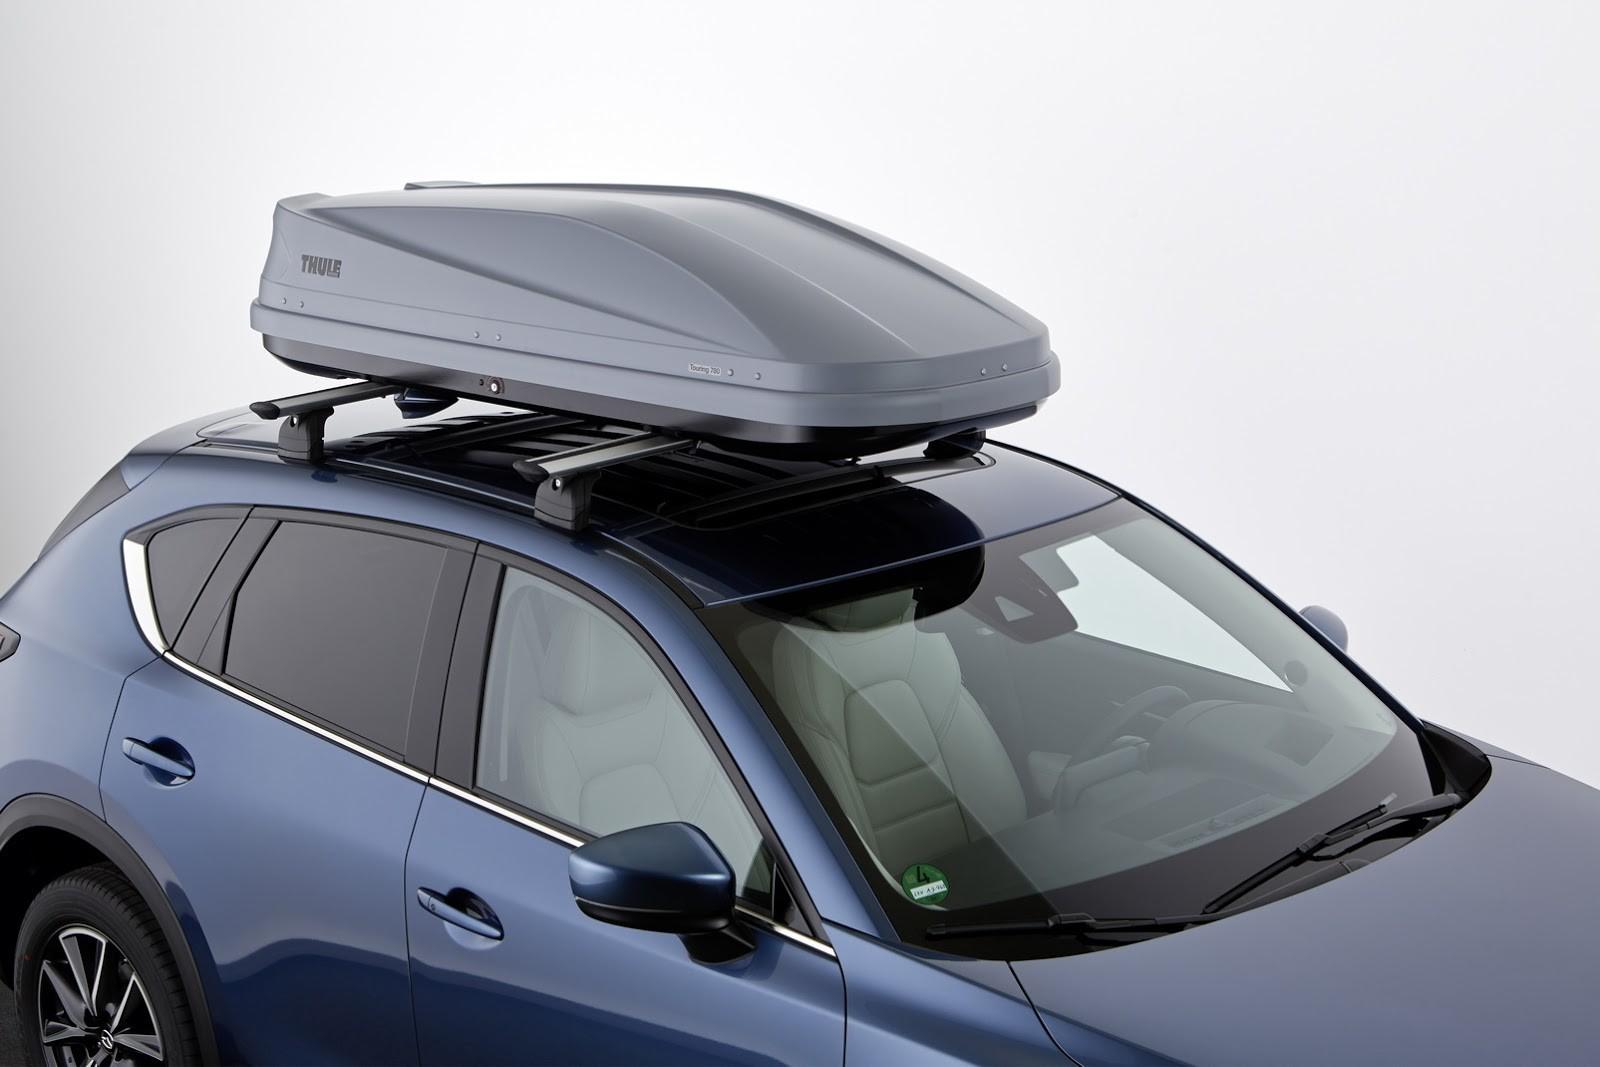 Foto de Accesorios para Mazda CX-3 - CX-5 (12/12)